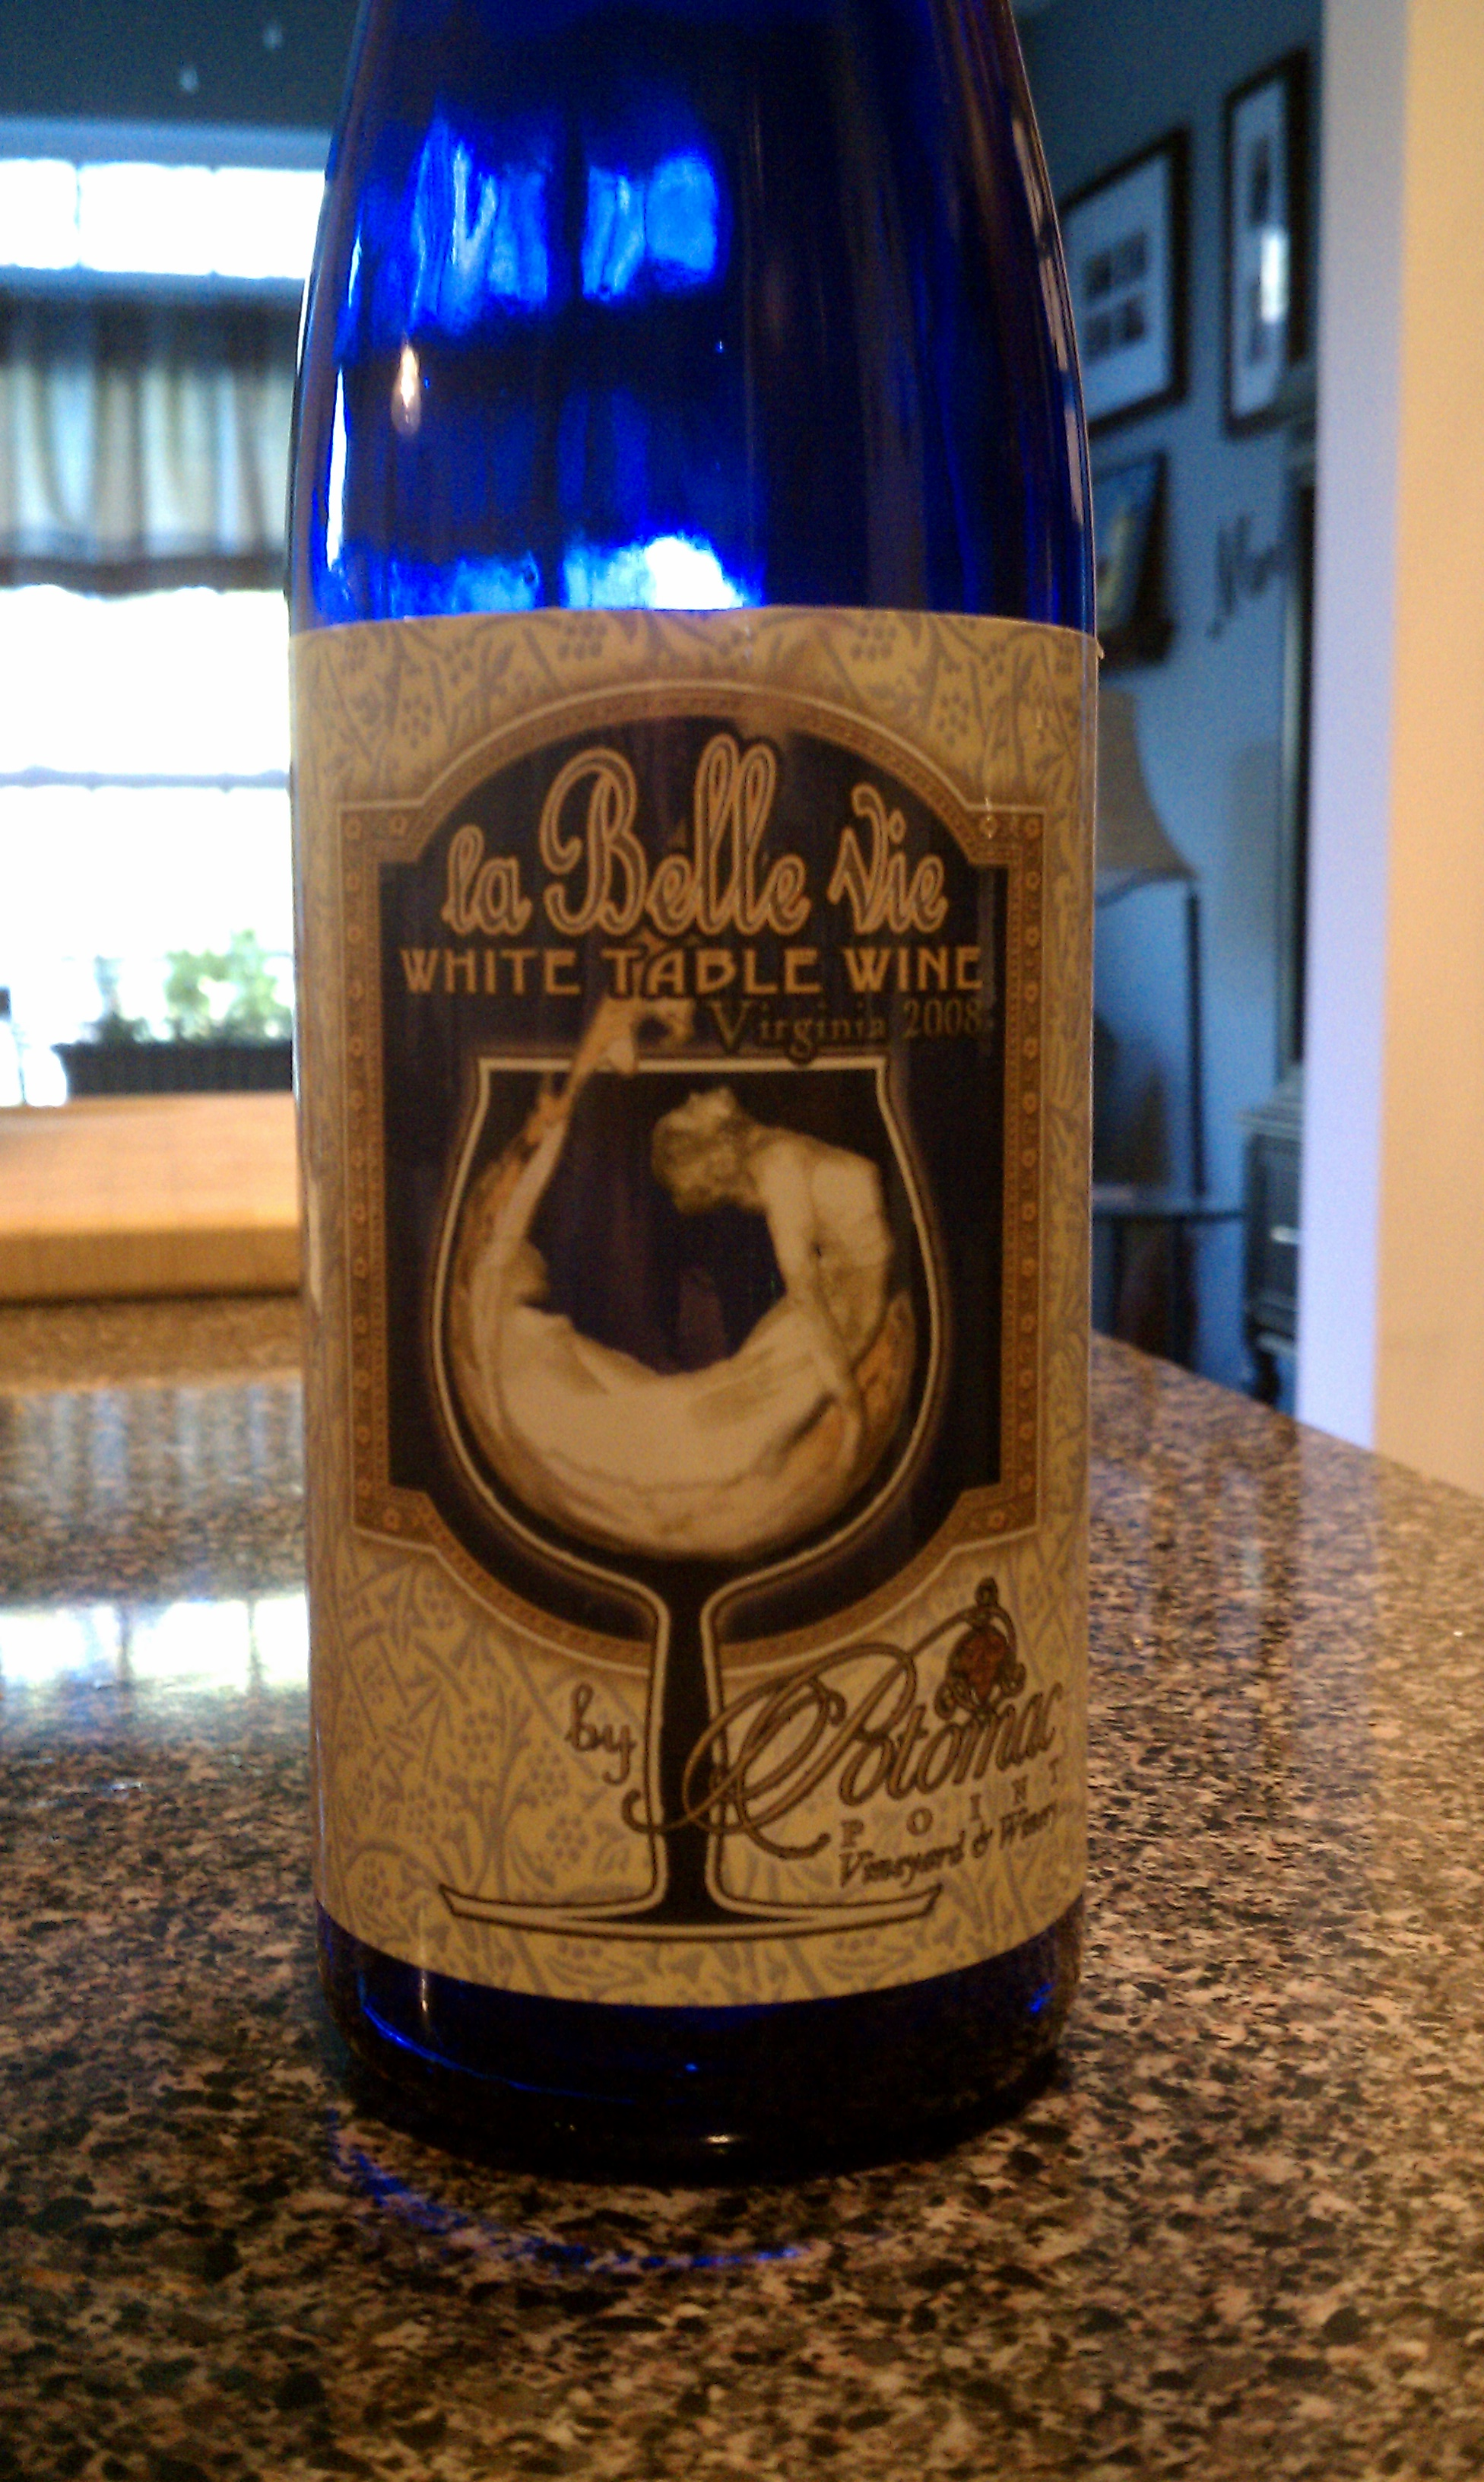 2008 Potomac Point Winery La Belle Vie